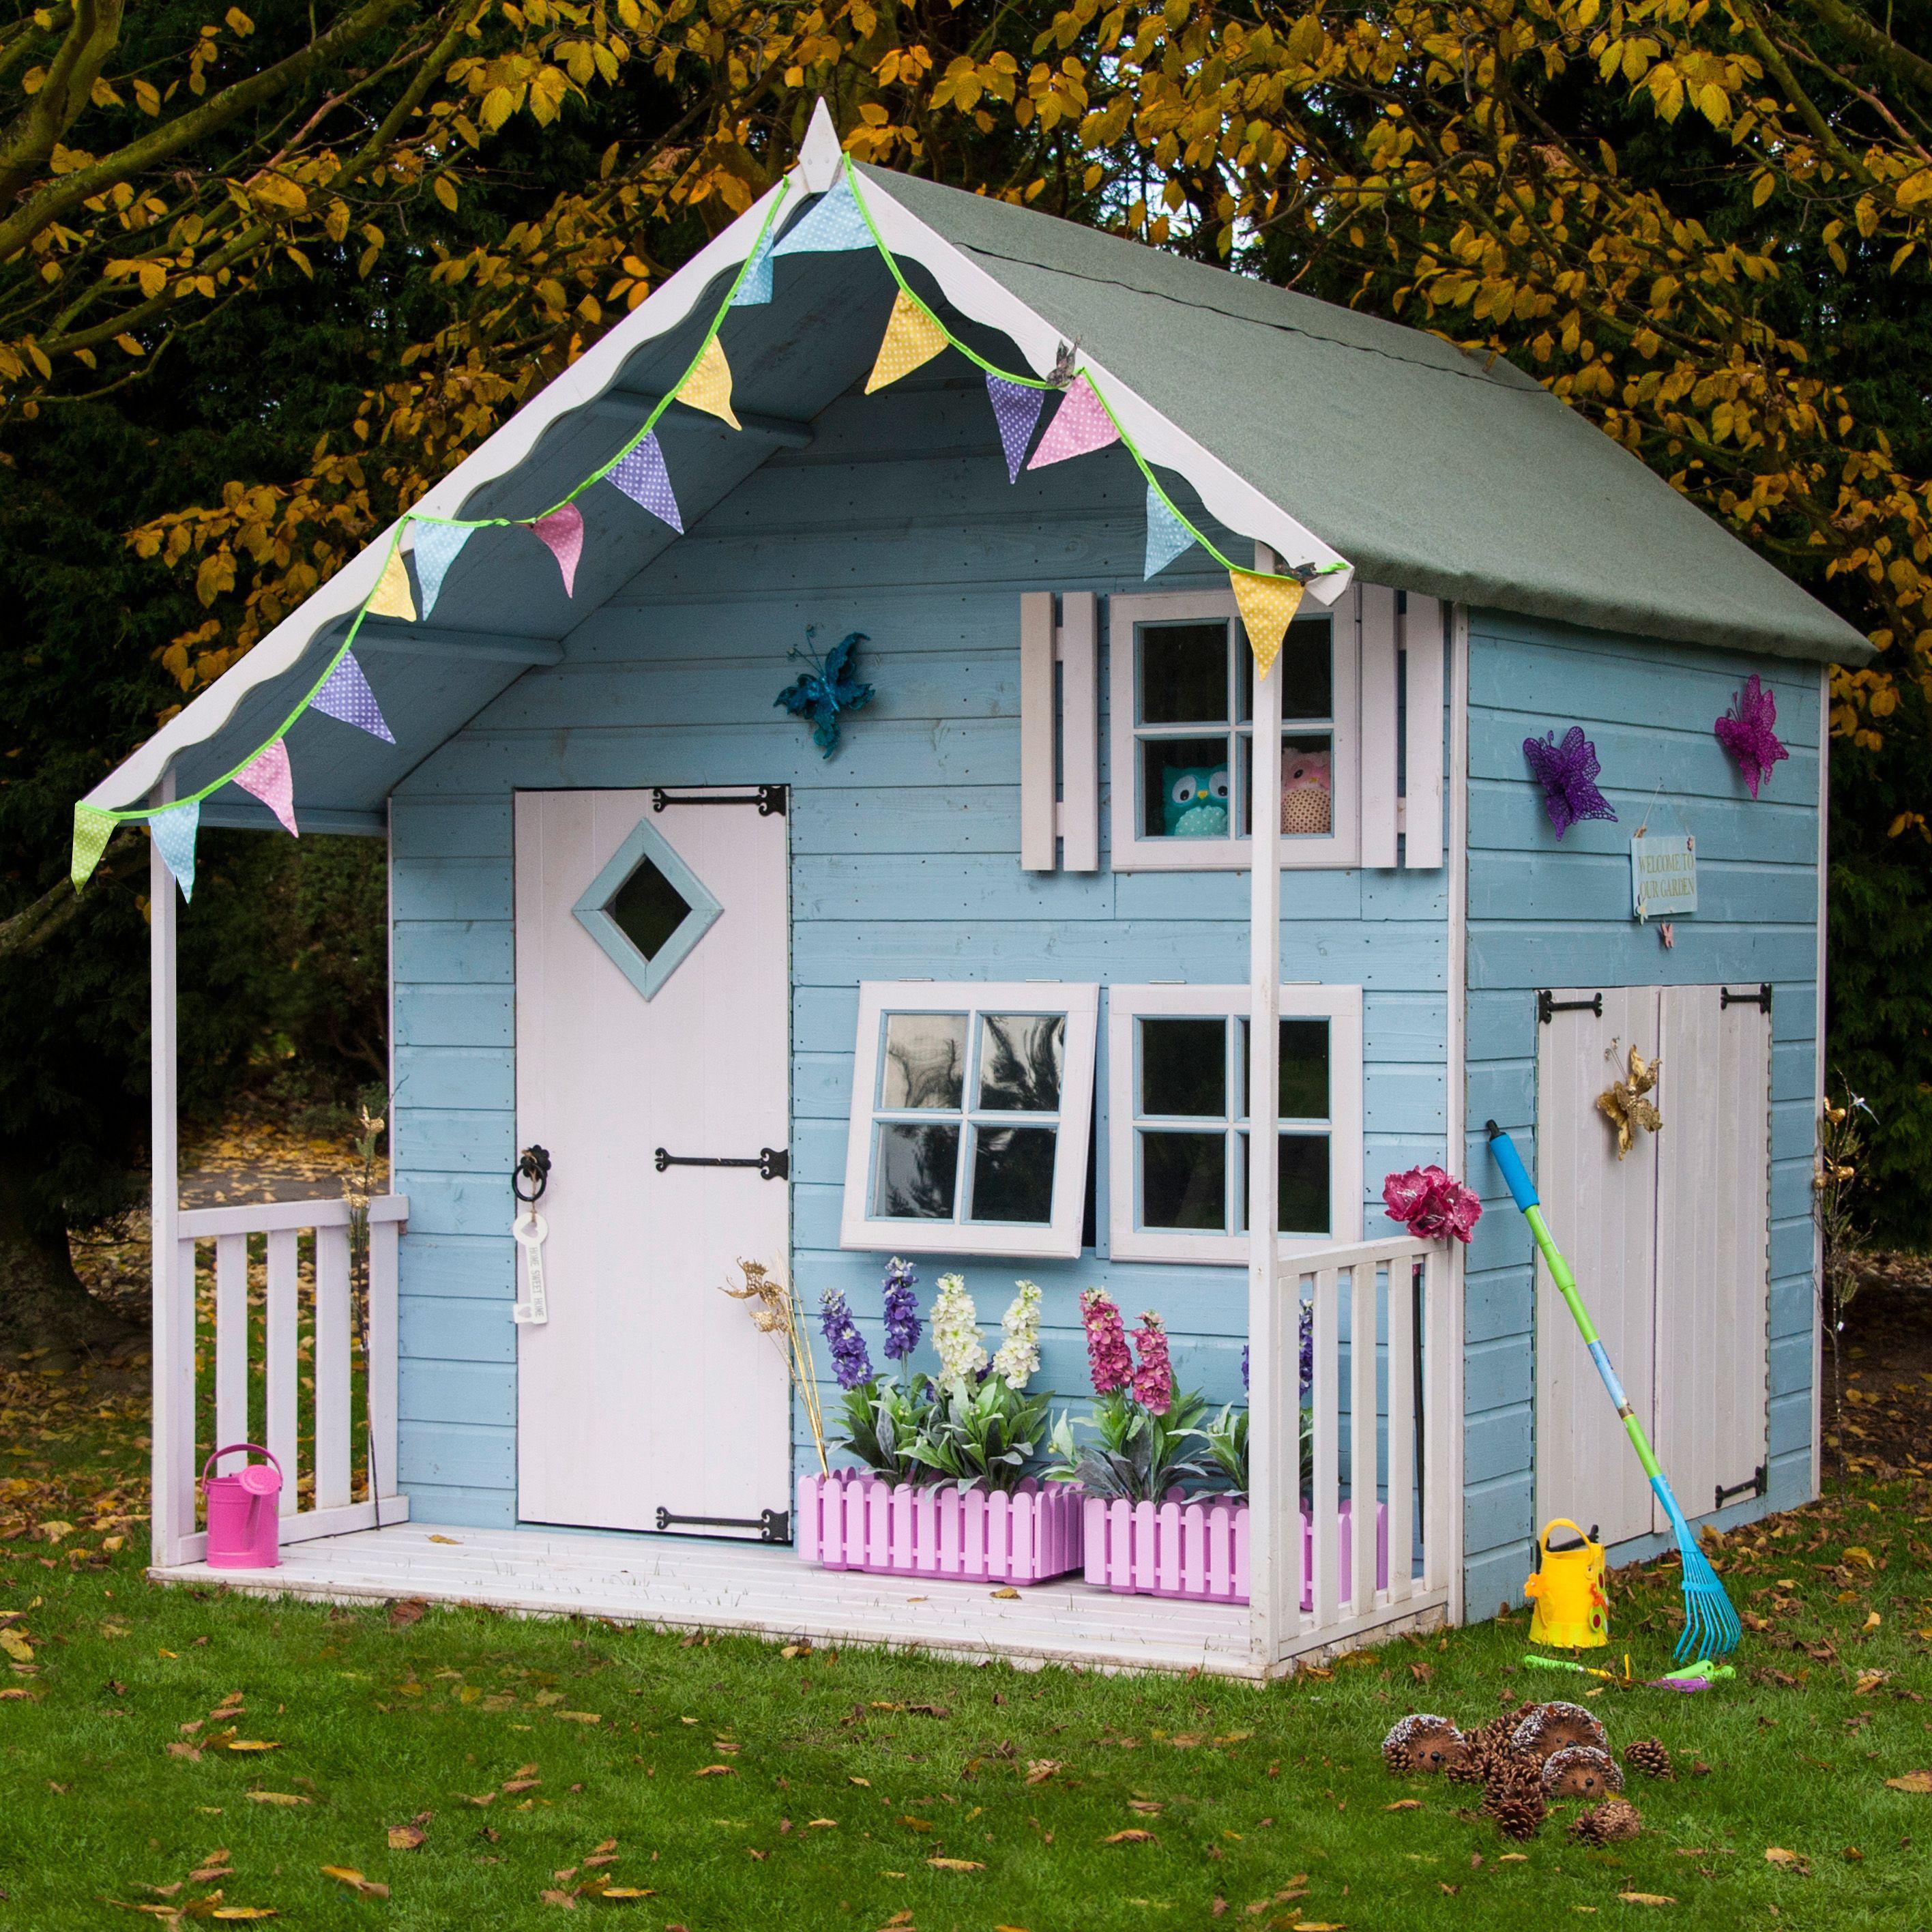 mini kitchen appliances making cabinet doors 7x8 crib playhouse | departments diy at b&q